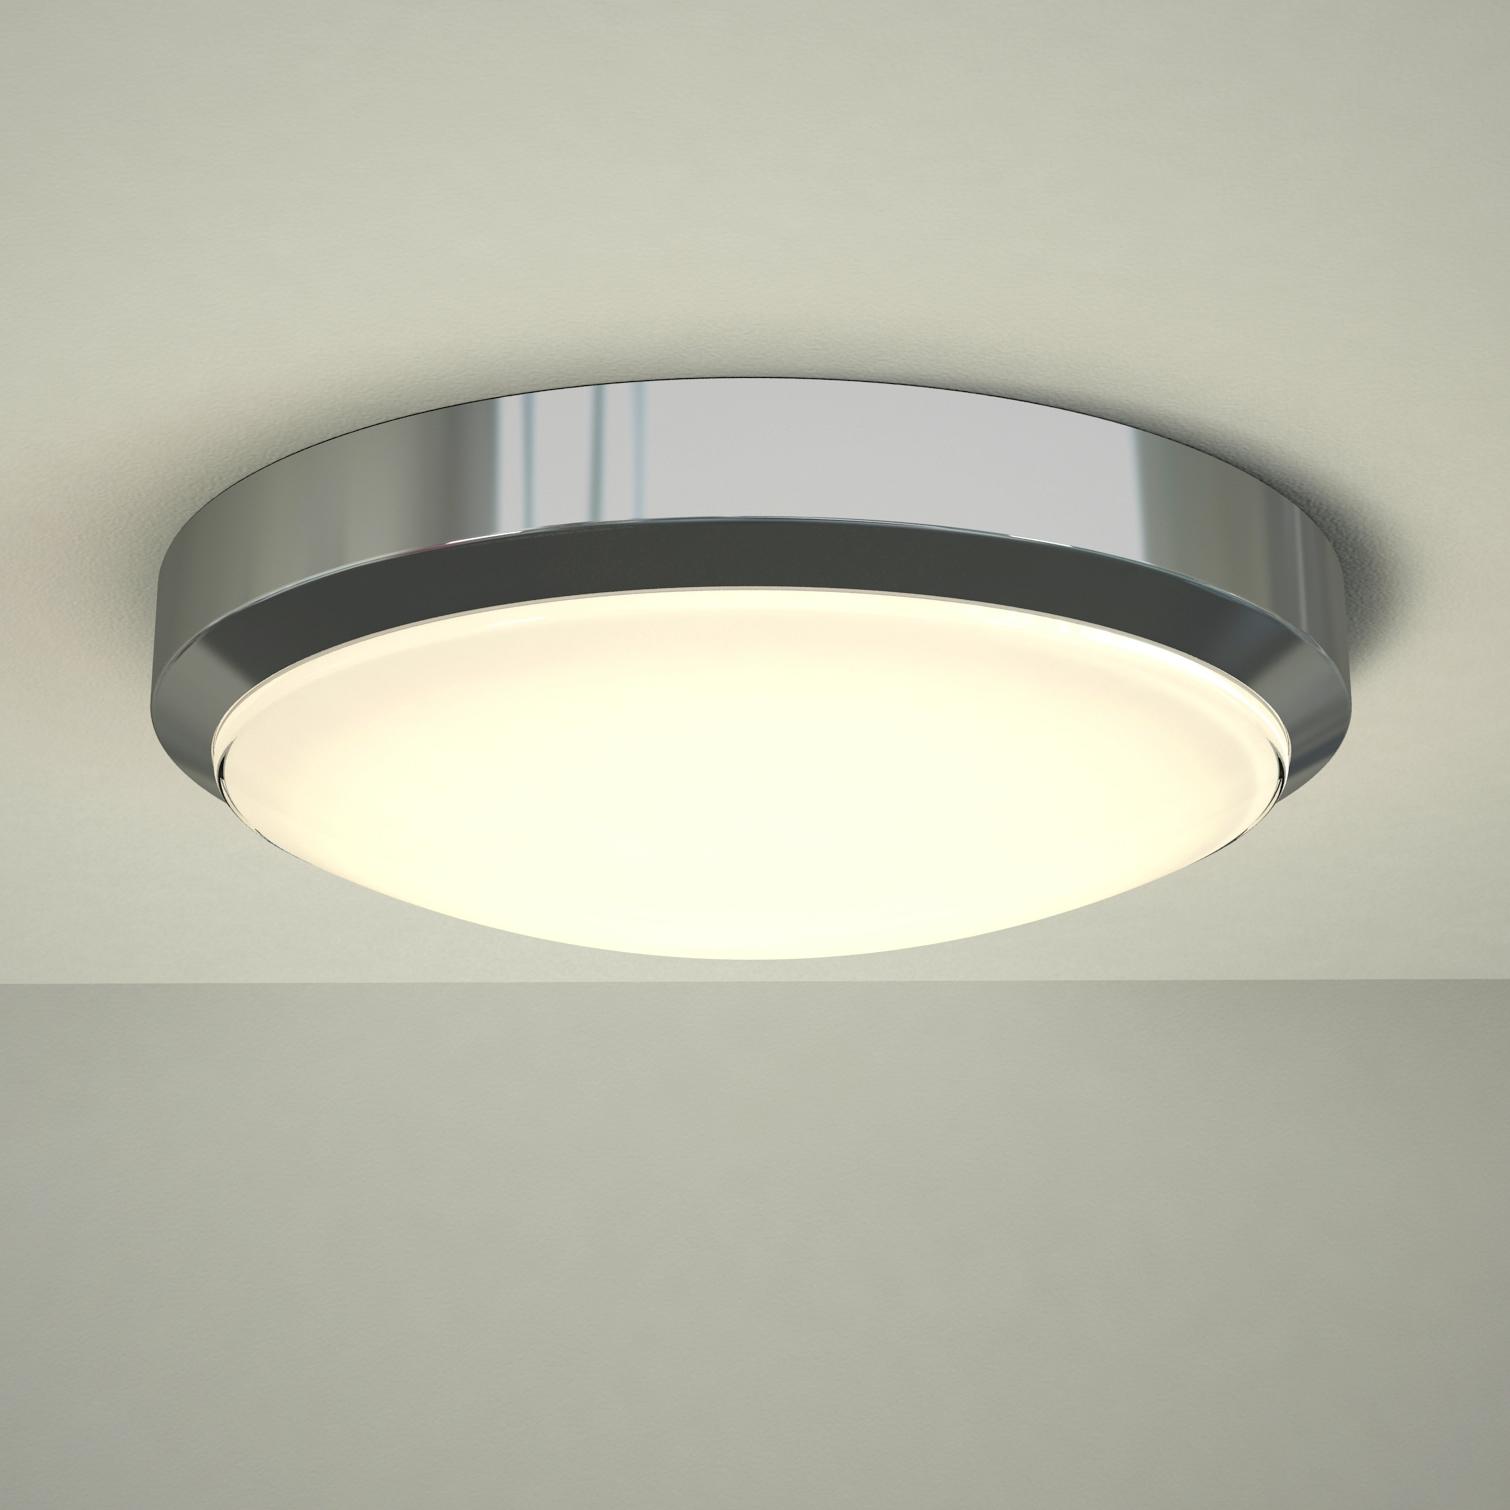 Tahoe 18W LED Badkamer Plafondlamp Ø 28cm